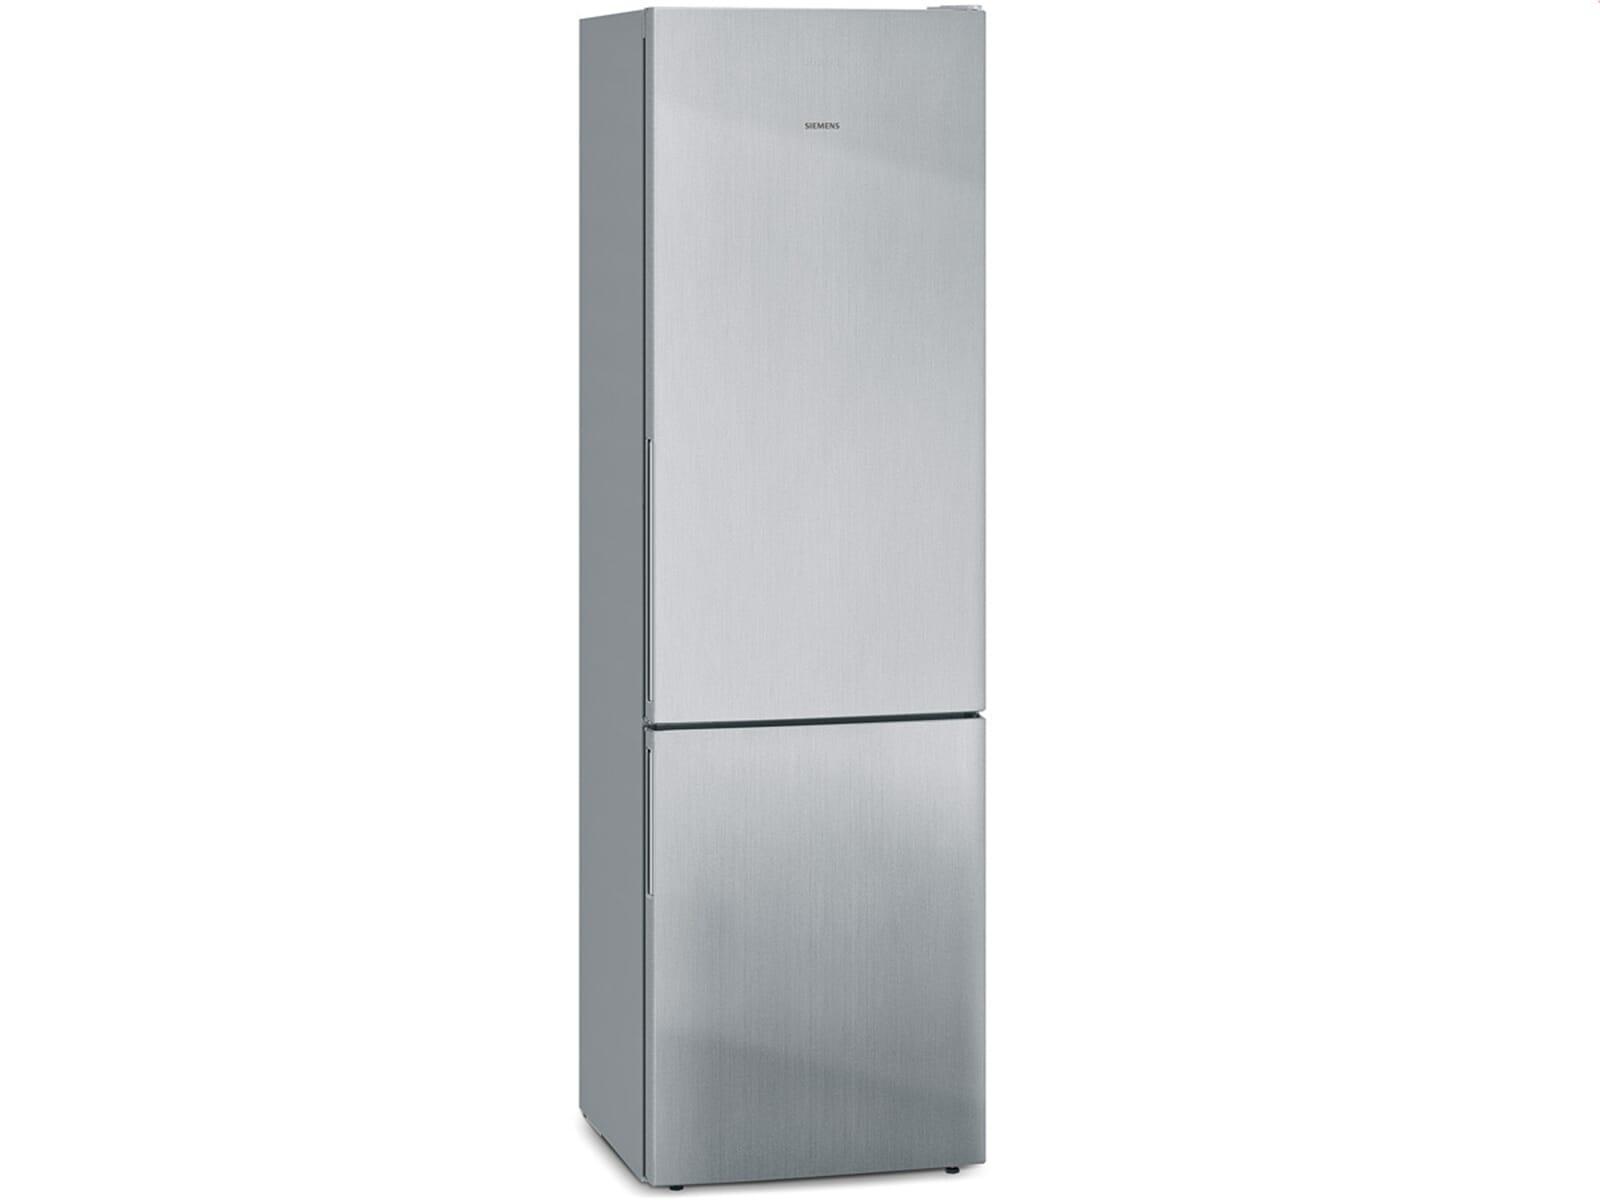 Siemens Kühlschrank Edelstahl : Siemens kg39edi40 kühl gefrierkombination edelstahl